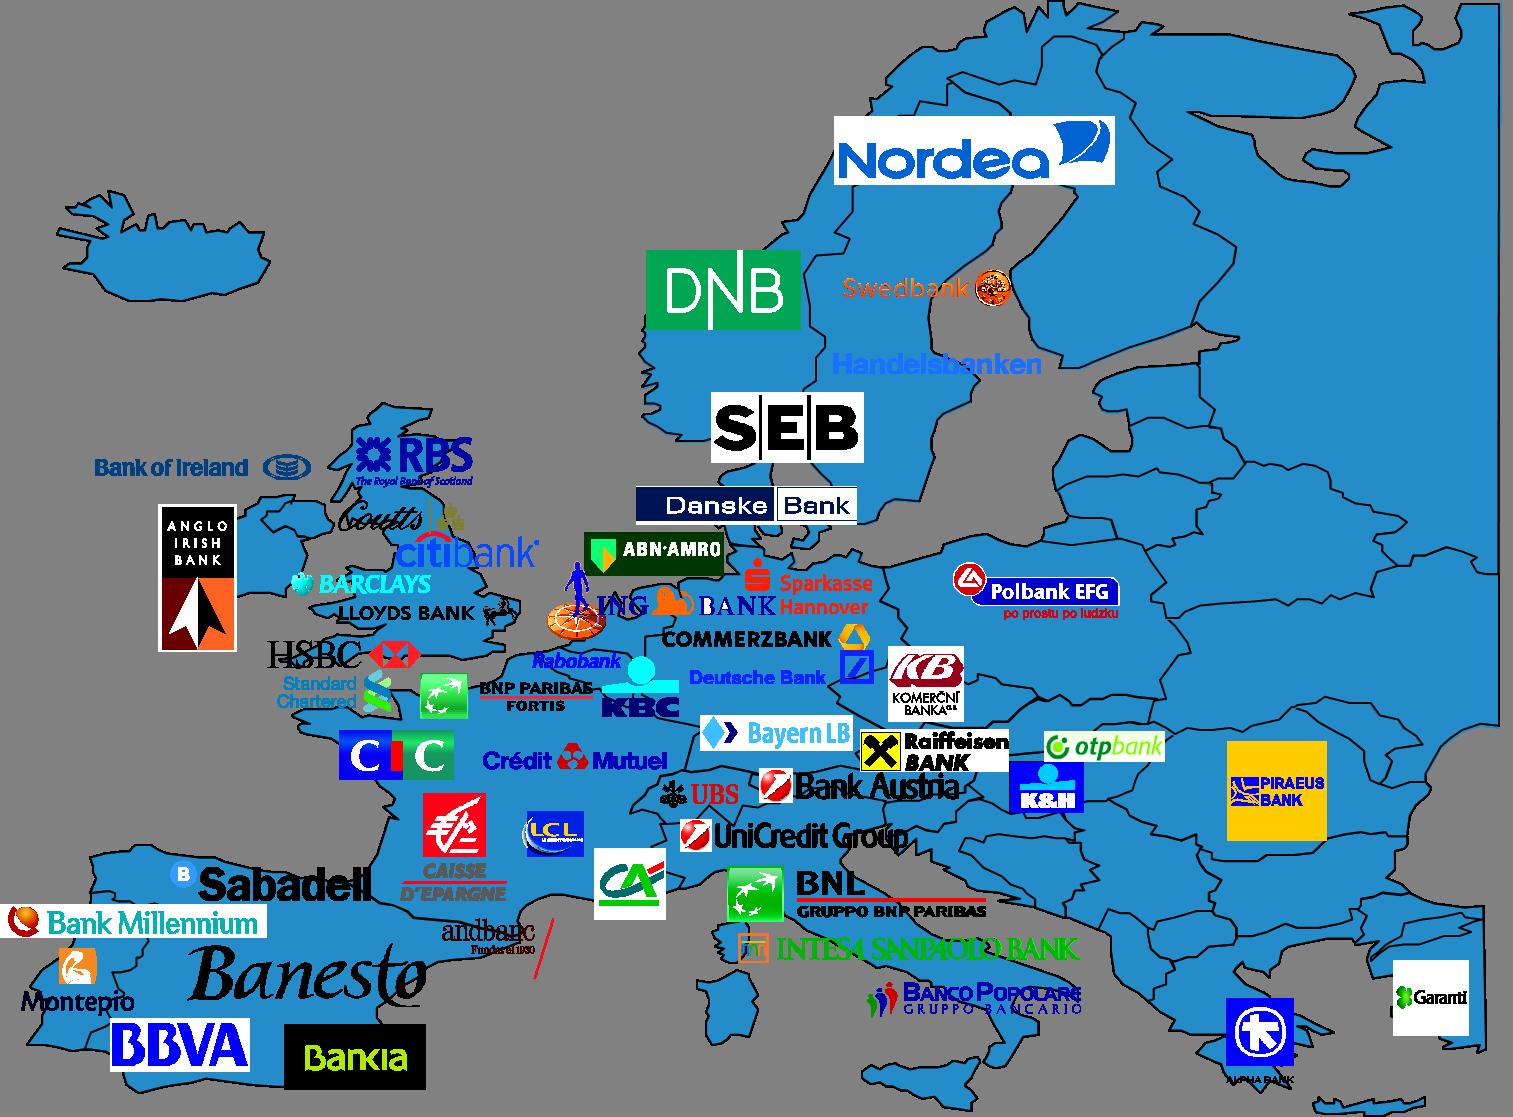 European banking landscape